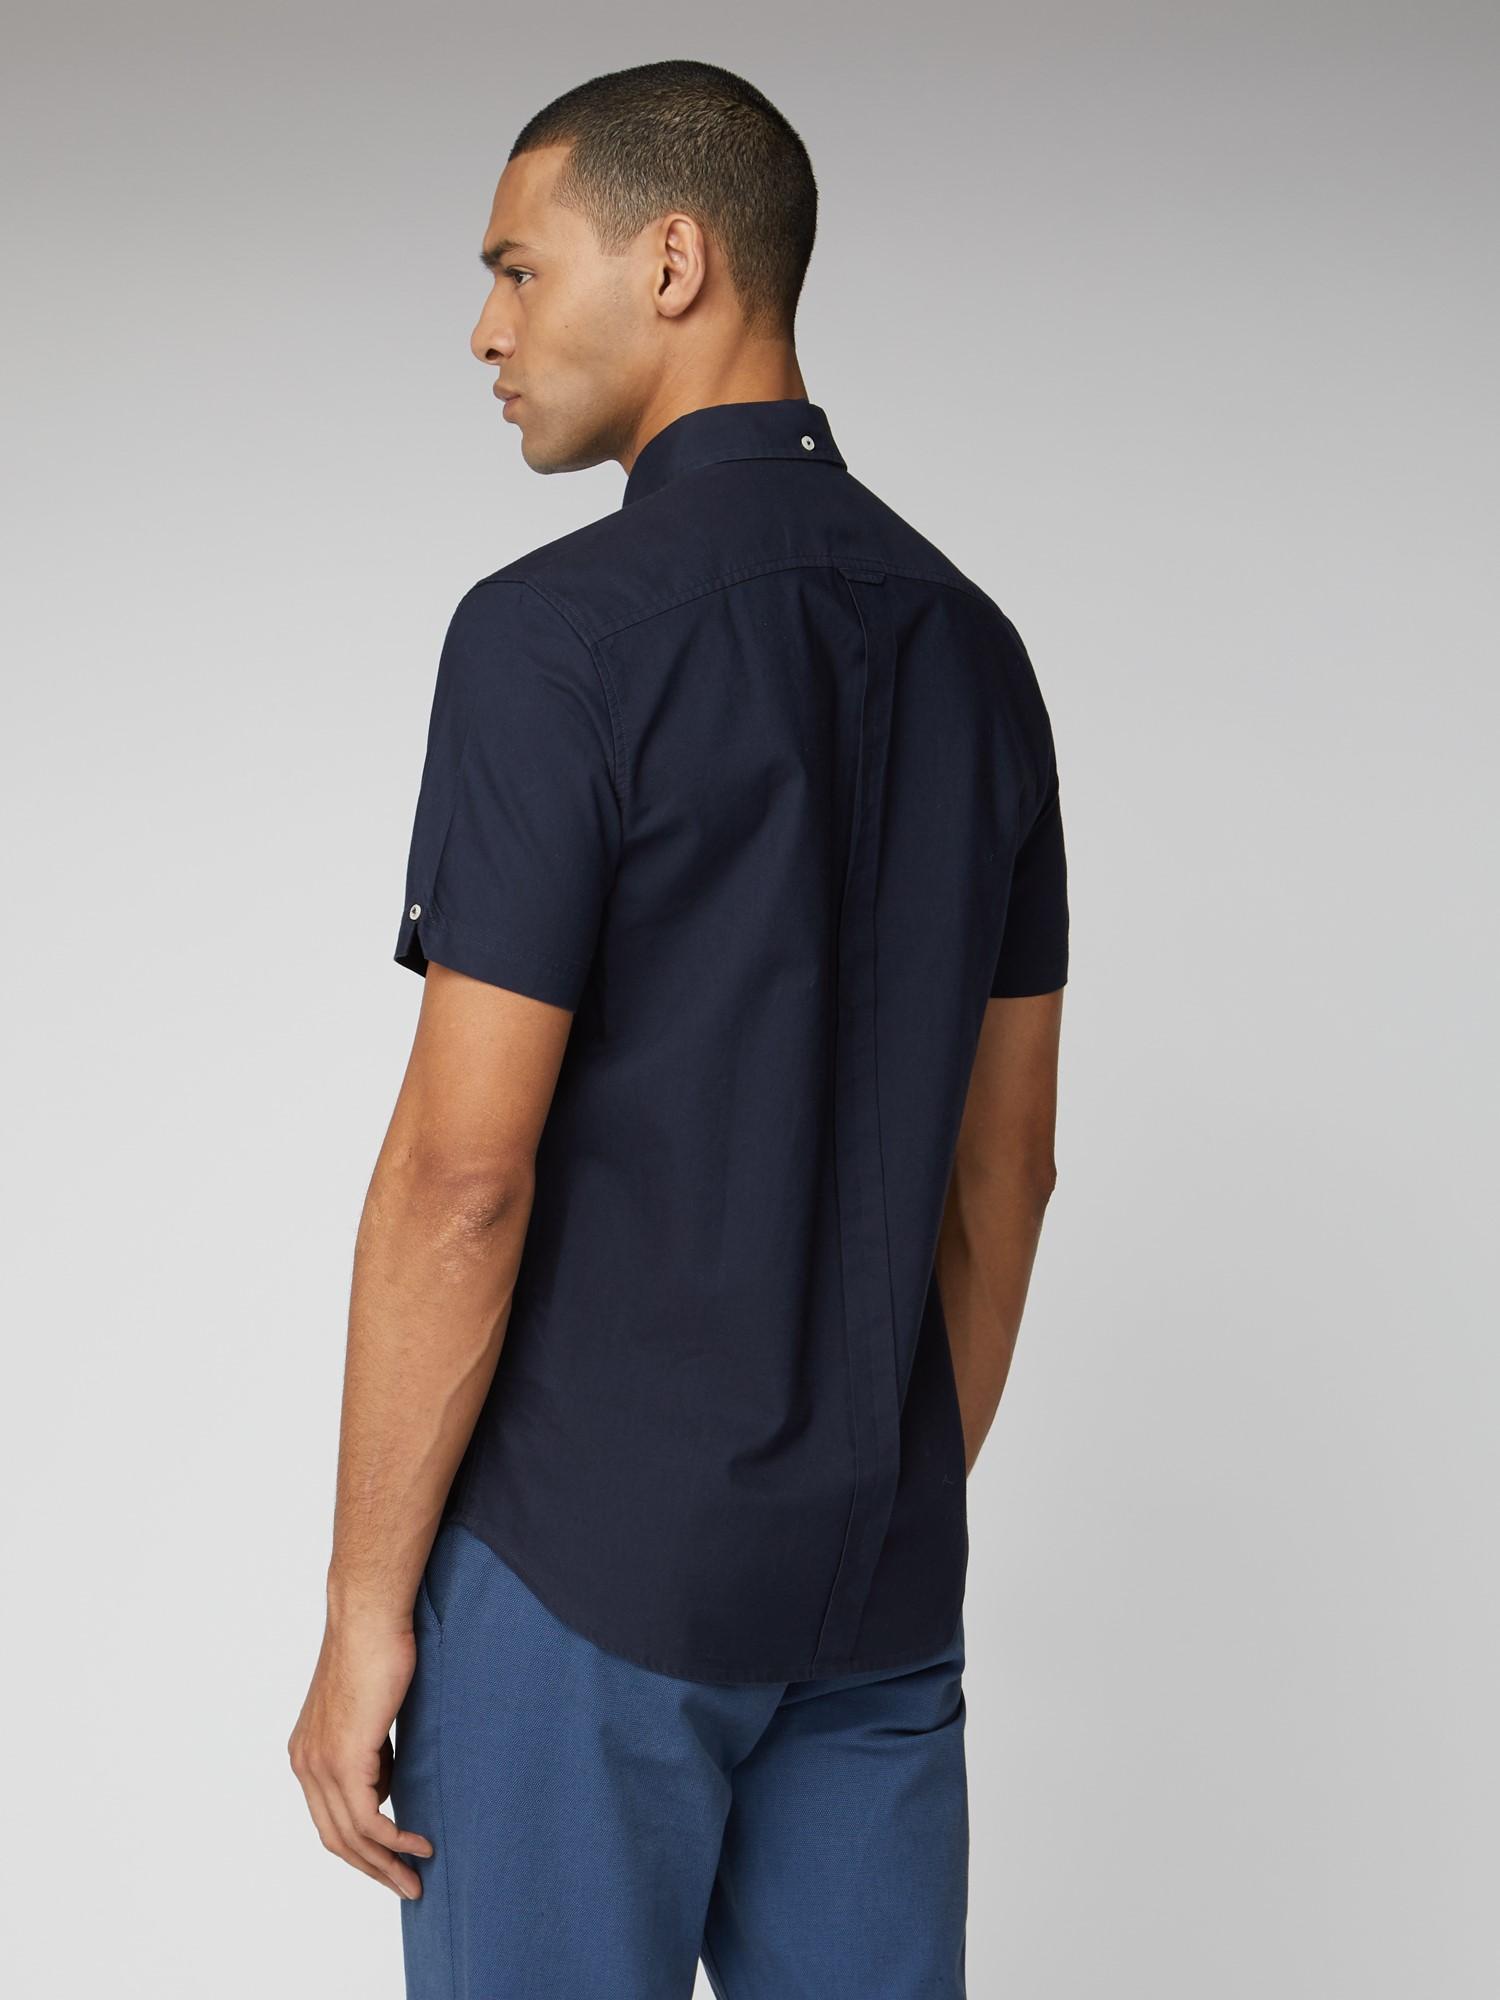 Signature Navy Button Down Oxford Shirt